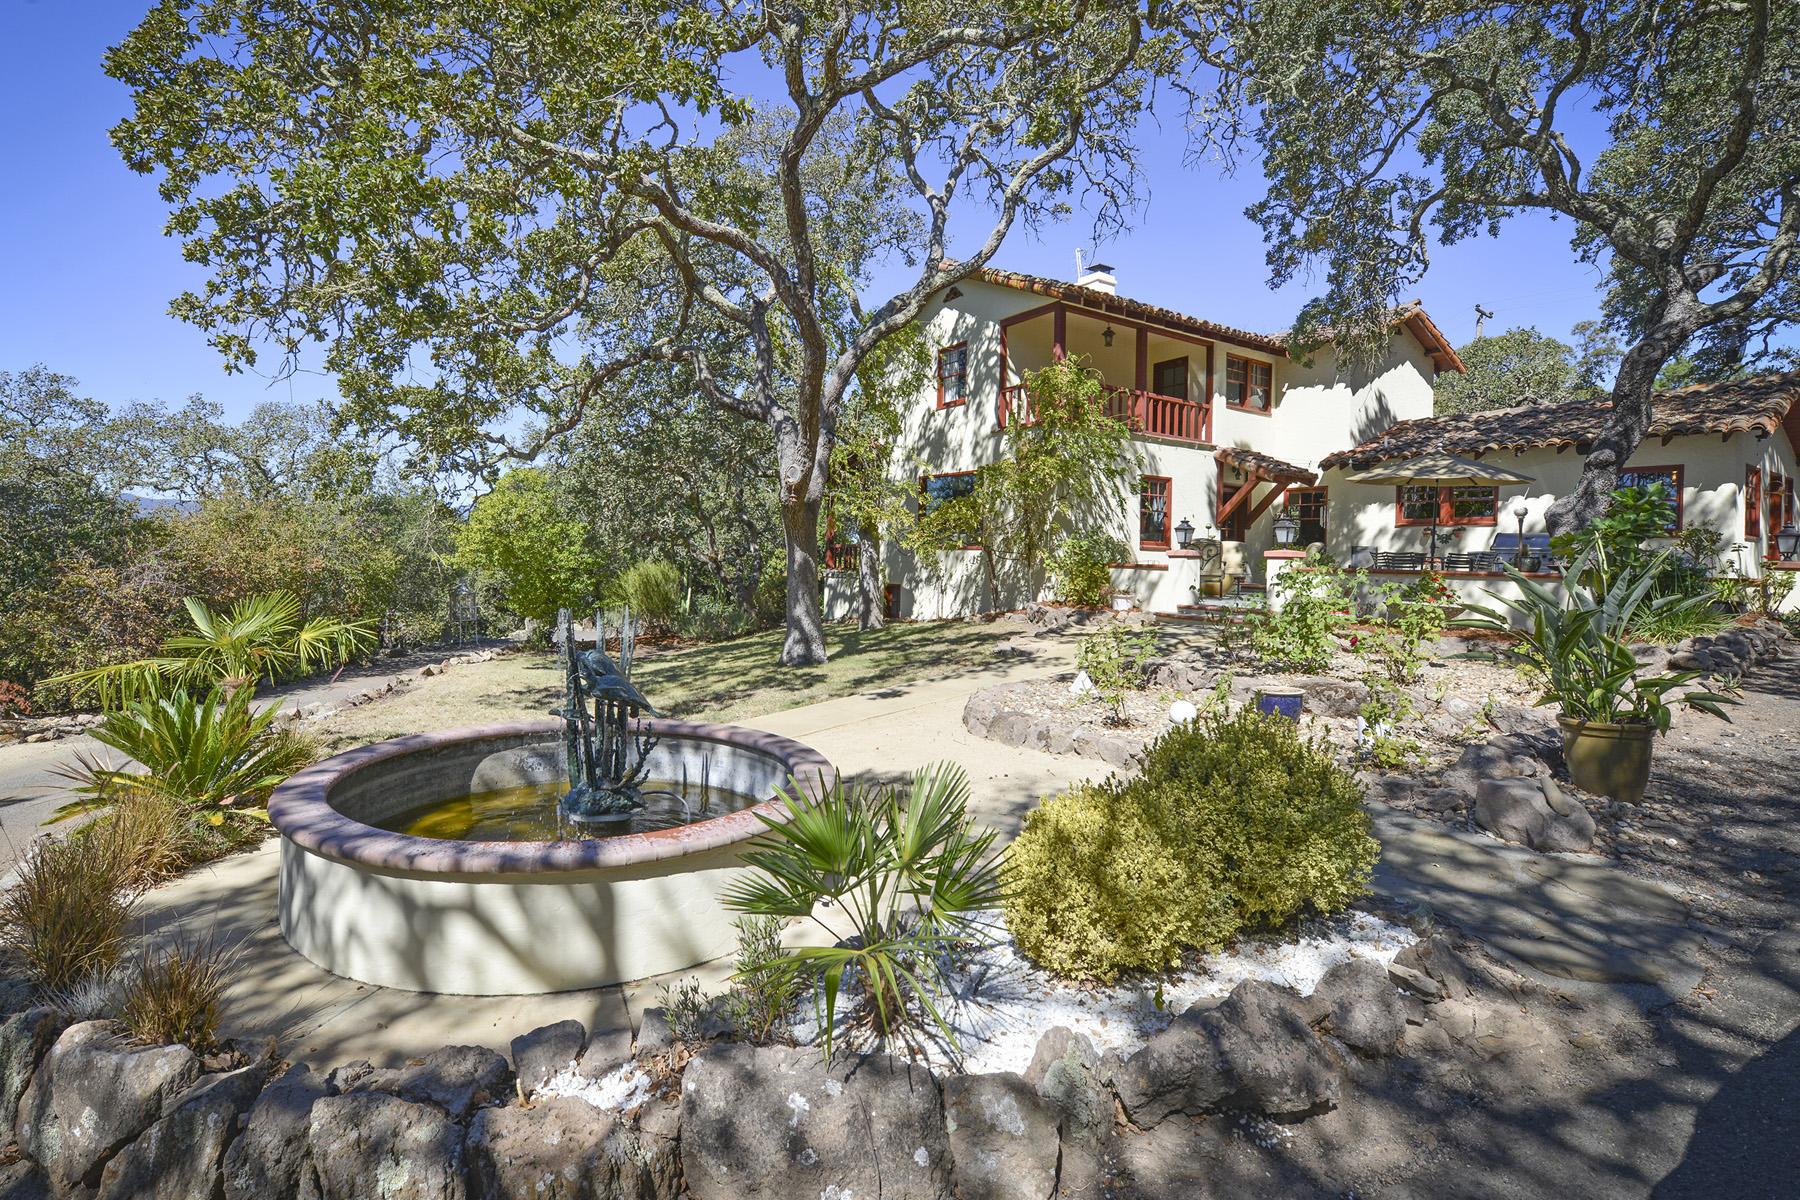 Single Family Home for Sale at 1878 Silverado Trl, Napa, CA 94558 1878 Silverado Trl Napa, California 94558 United States